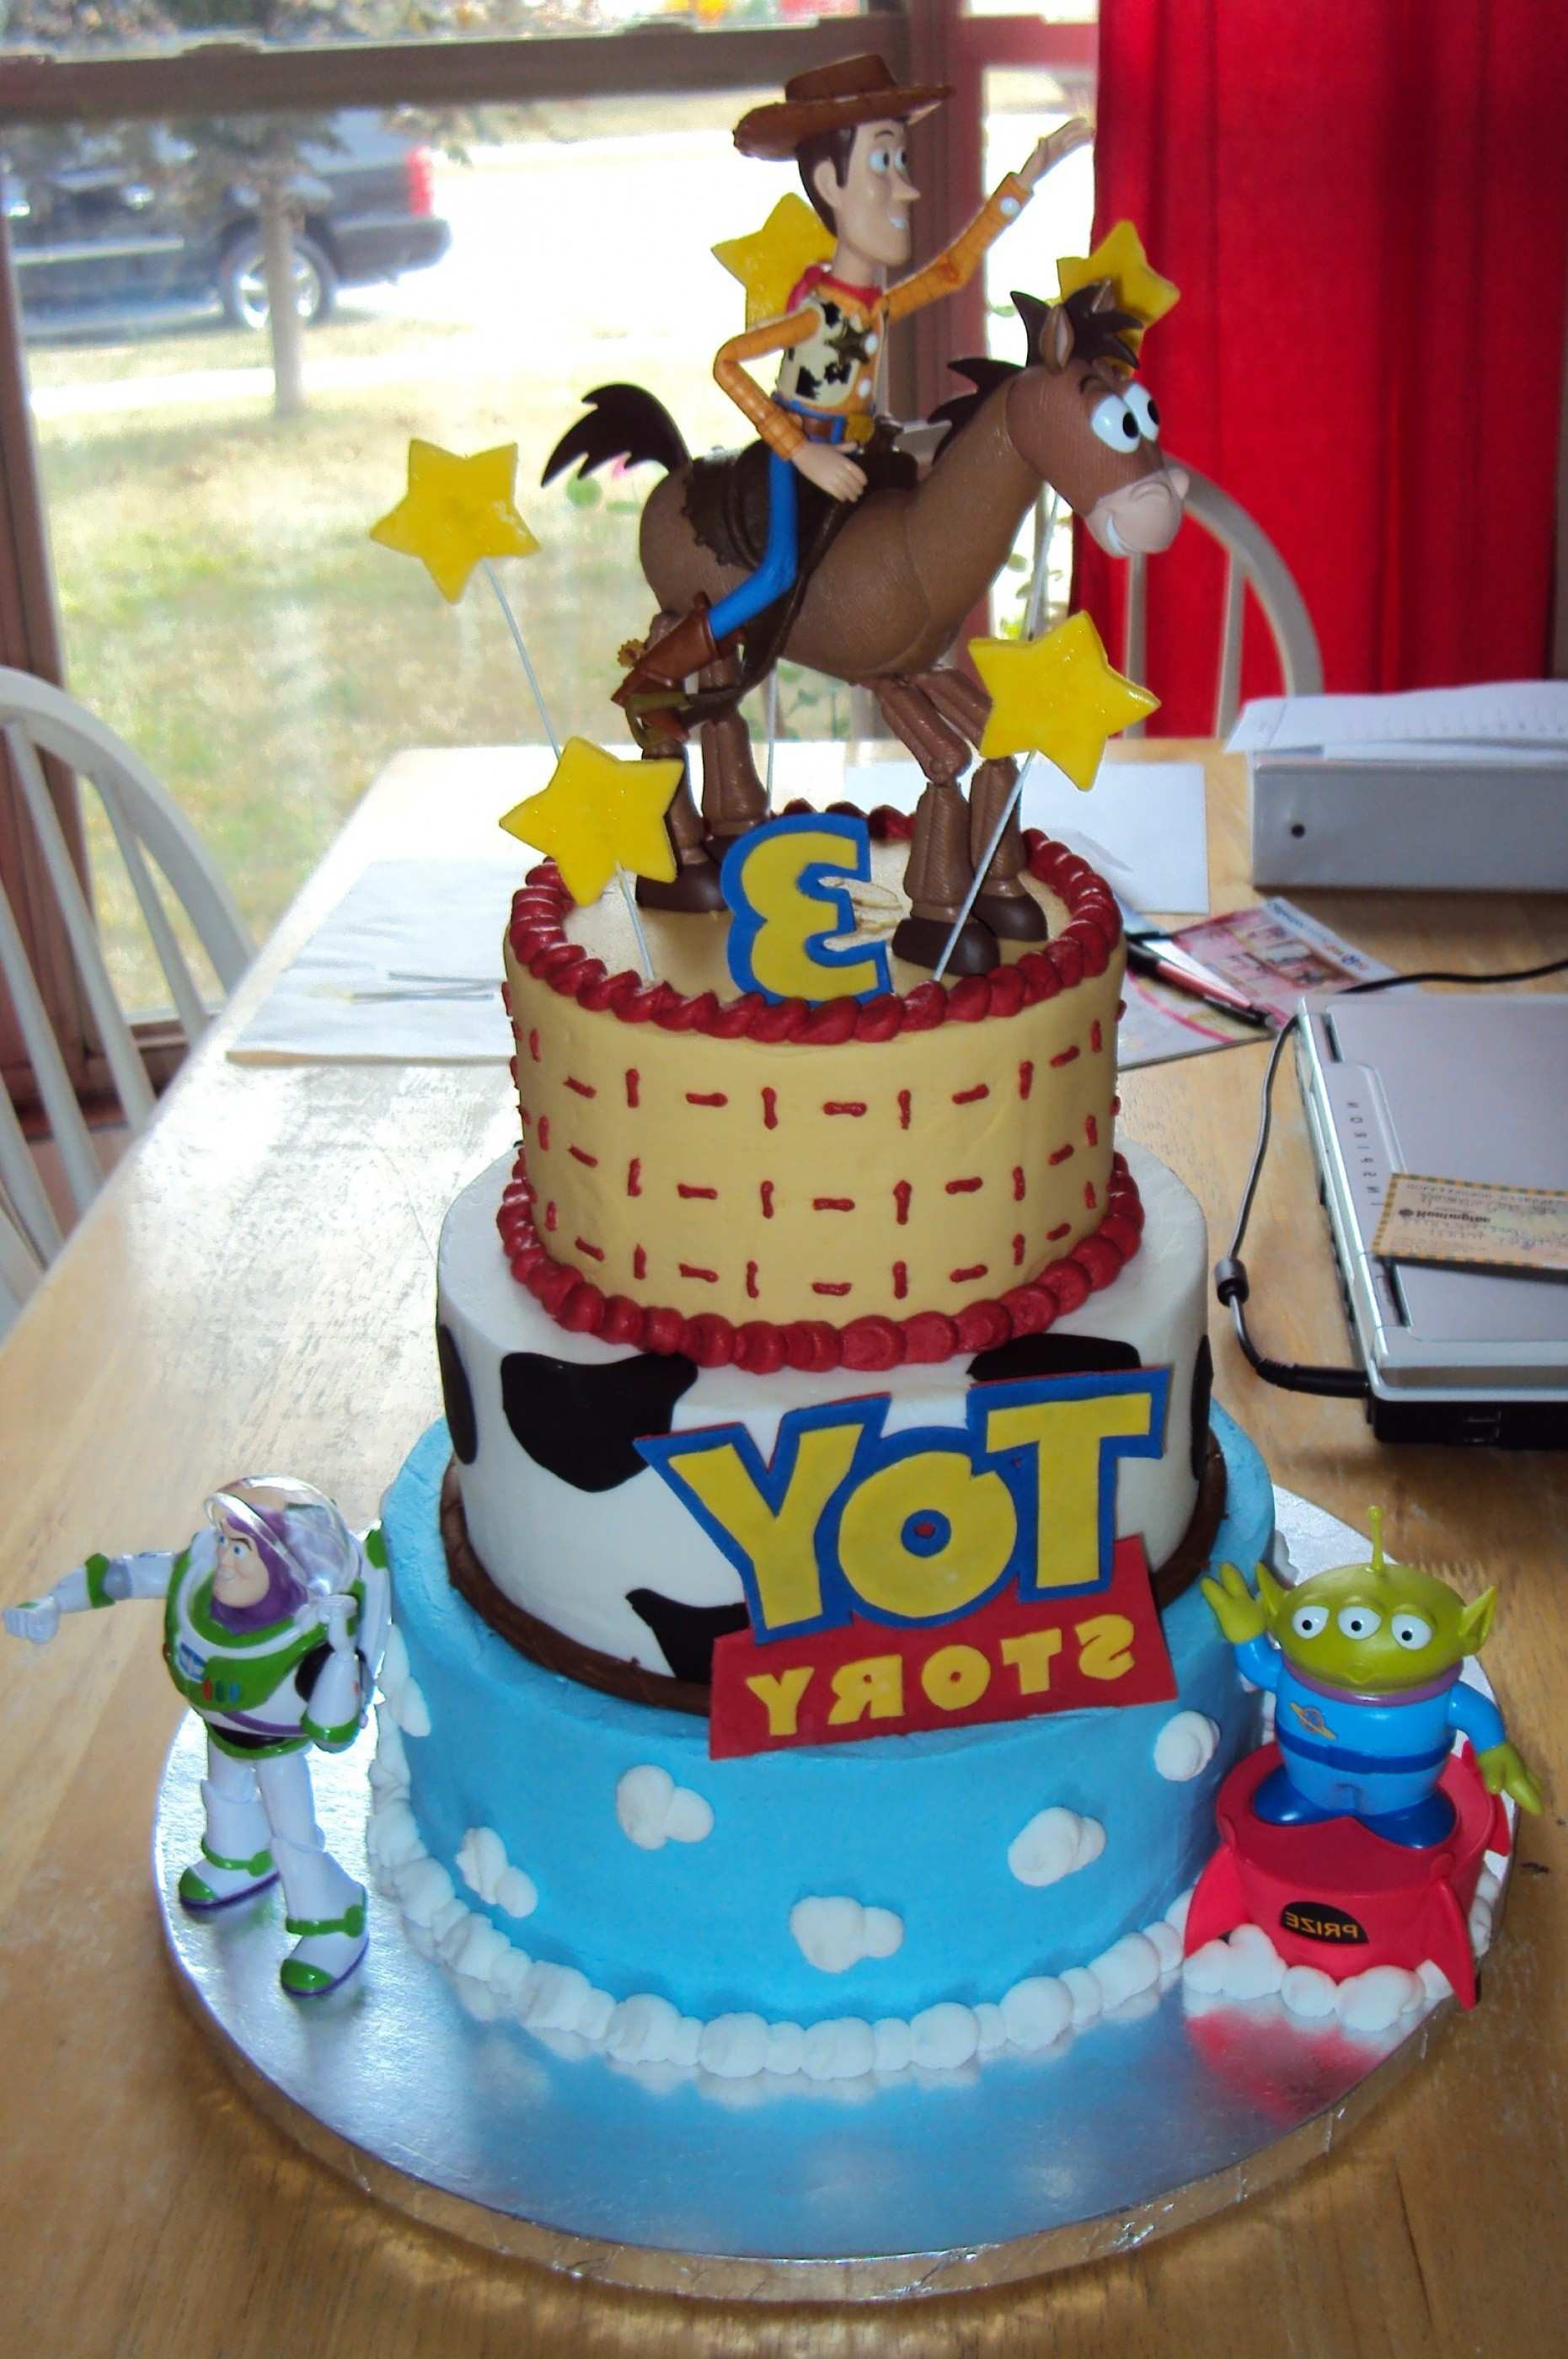 Best ideas about Walmart Birthday Cake Catalogue . Save or Pin 47 Brilliant Walmart Wedding Cakes Catalog Jo O Now.